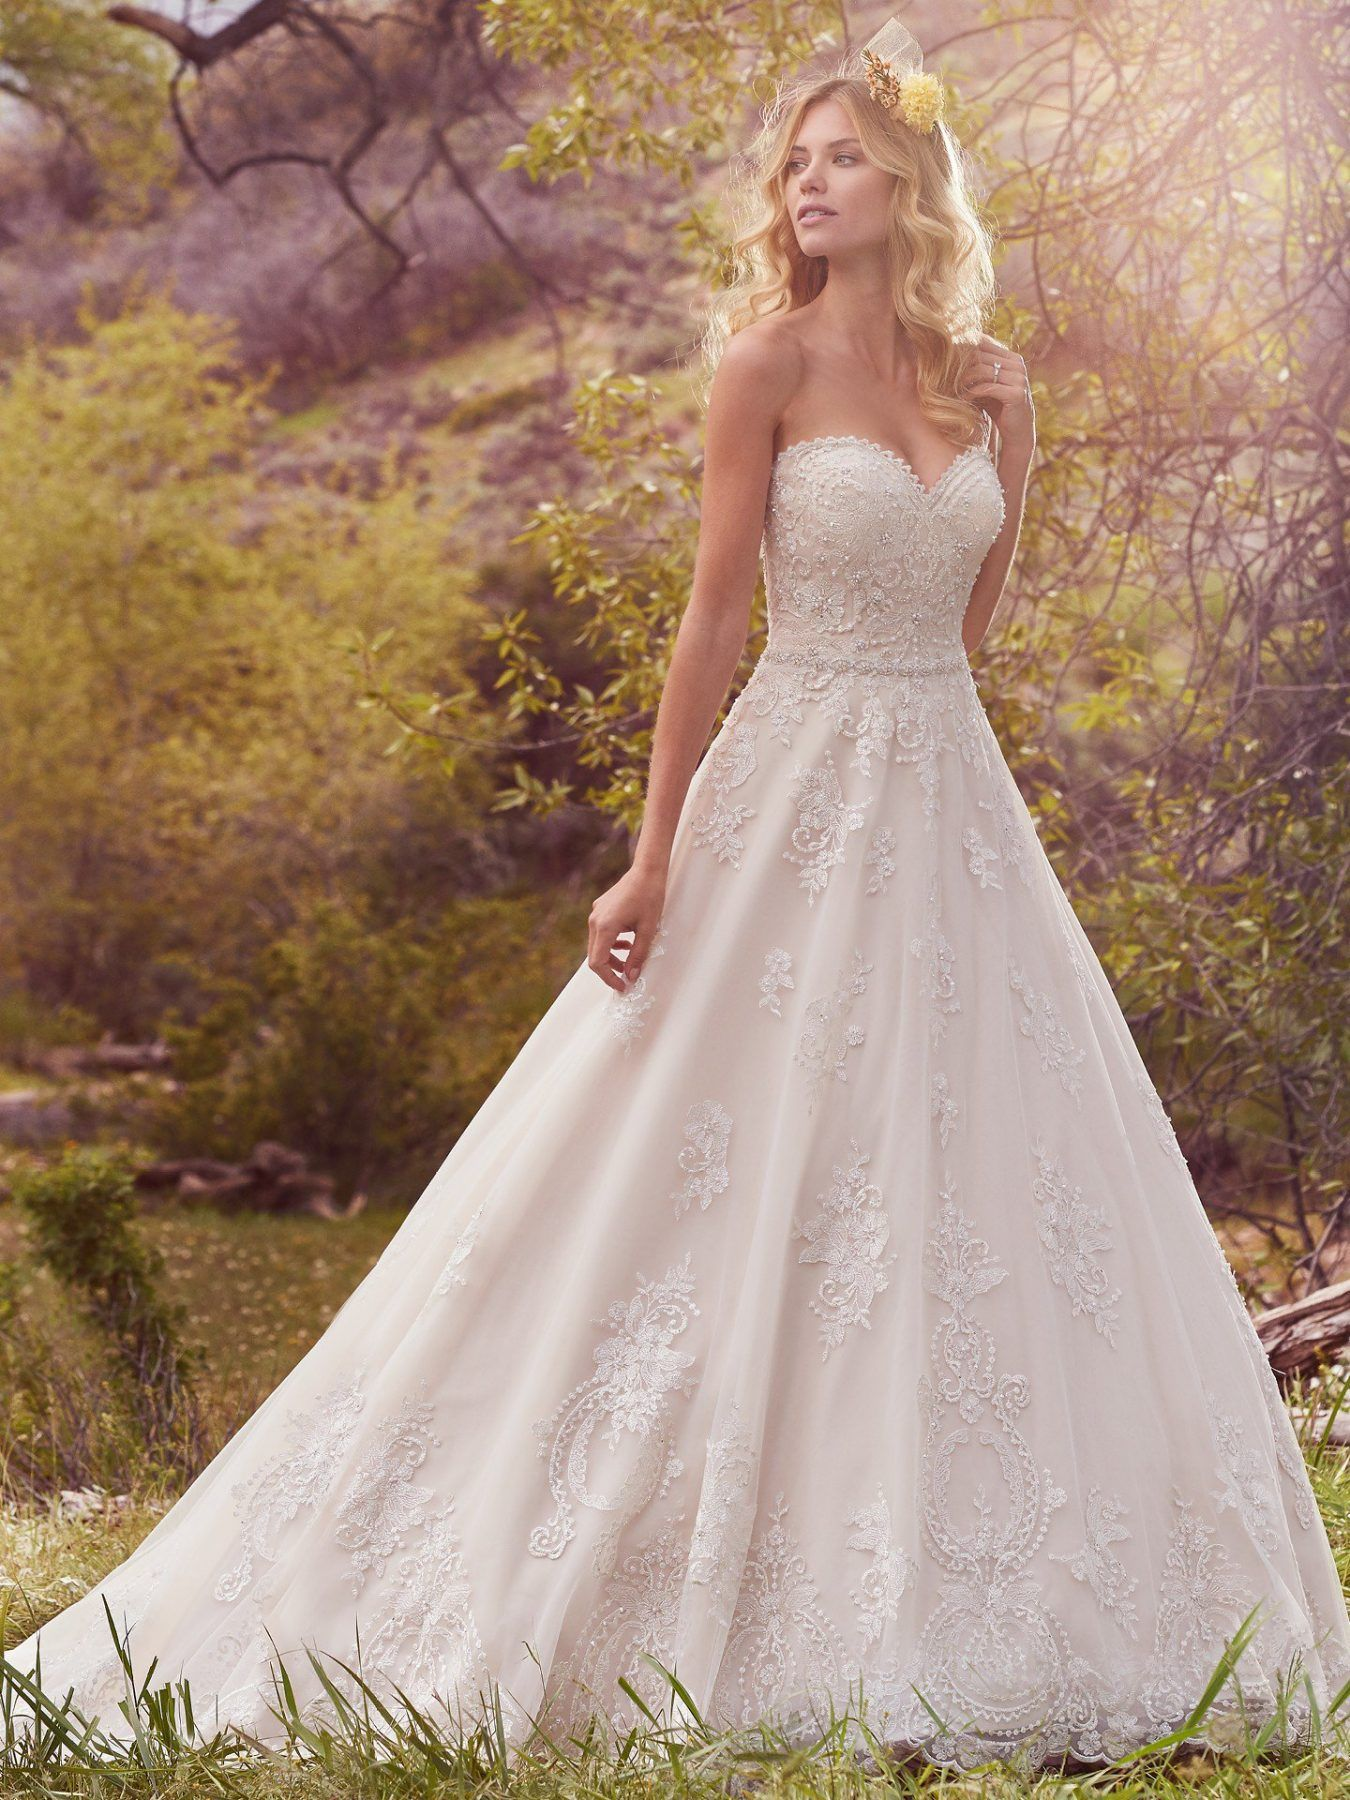 Sweetheart Neckline Beaded Bodice Full Skirt A Line Wedding Dress By Maggie Sottero Image 1 Wedding Dresses Kleinfeld Ball Gowns Wedding Wedding Dresses